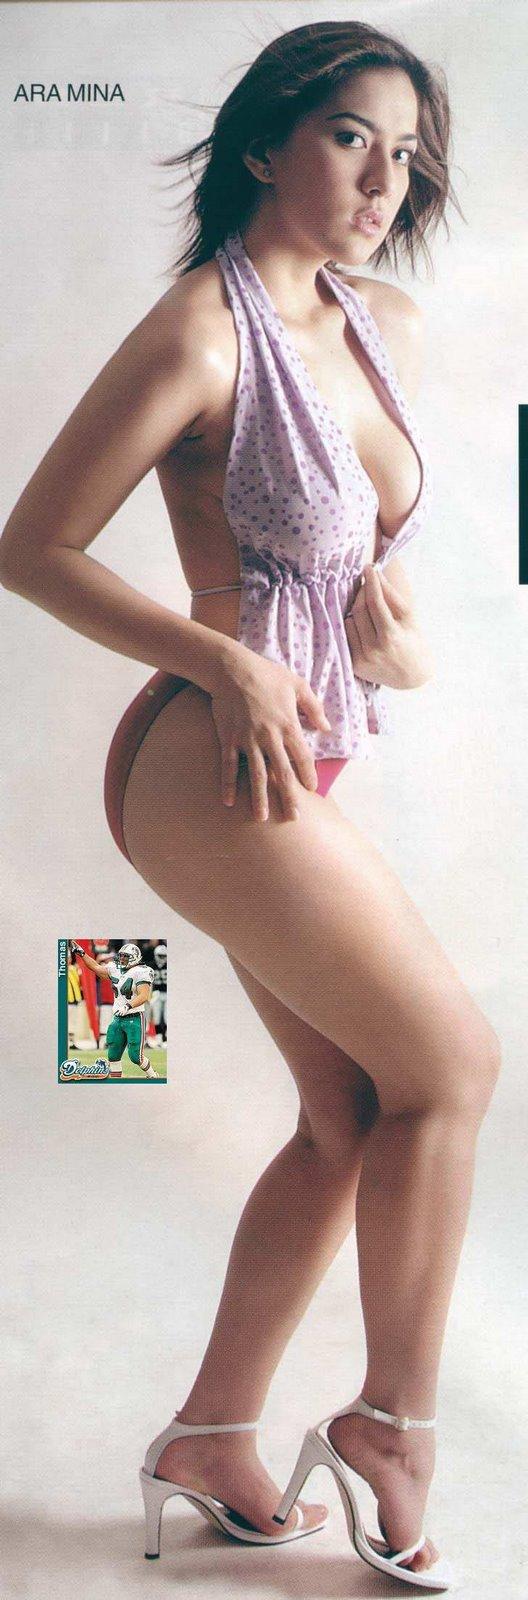 Lesbian bukkake clips Naked beautiful burmese girl Longest dick ever  recorded Porno ...